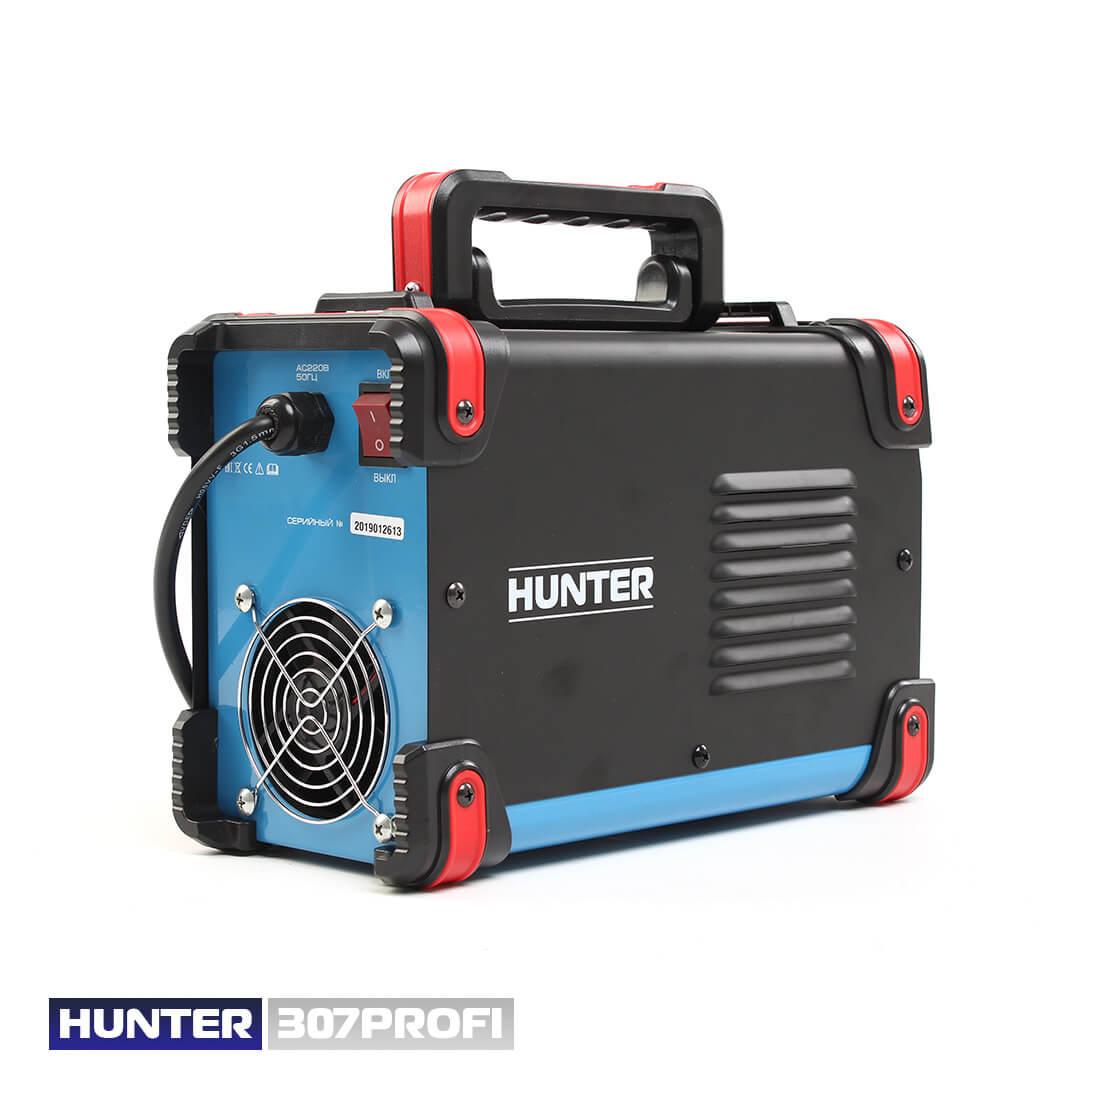 Фото Hunter MMA 307 PROFI (дуговая) цена 3150грн №7 — Hunter